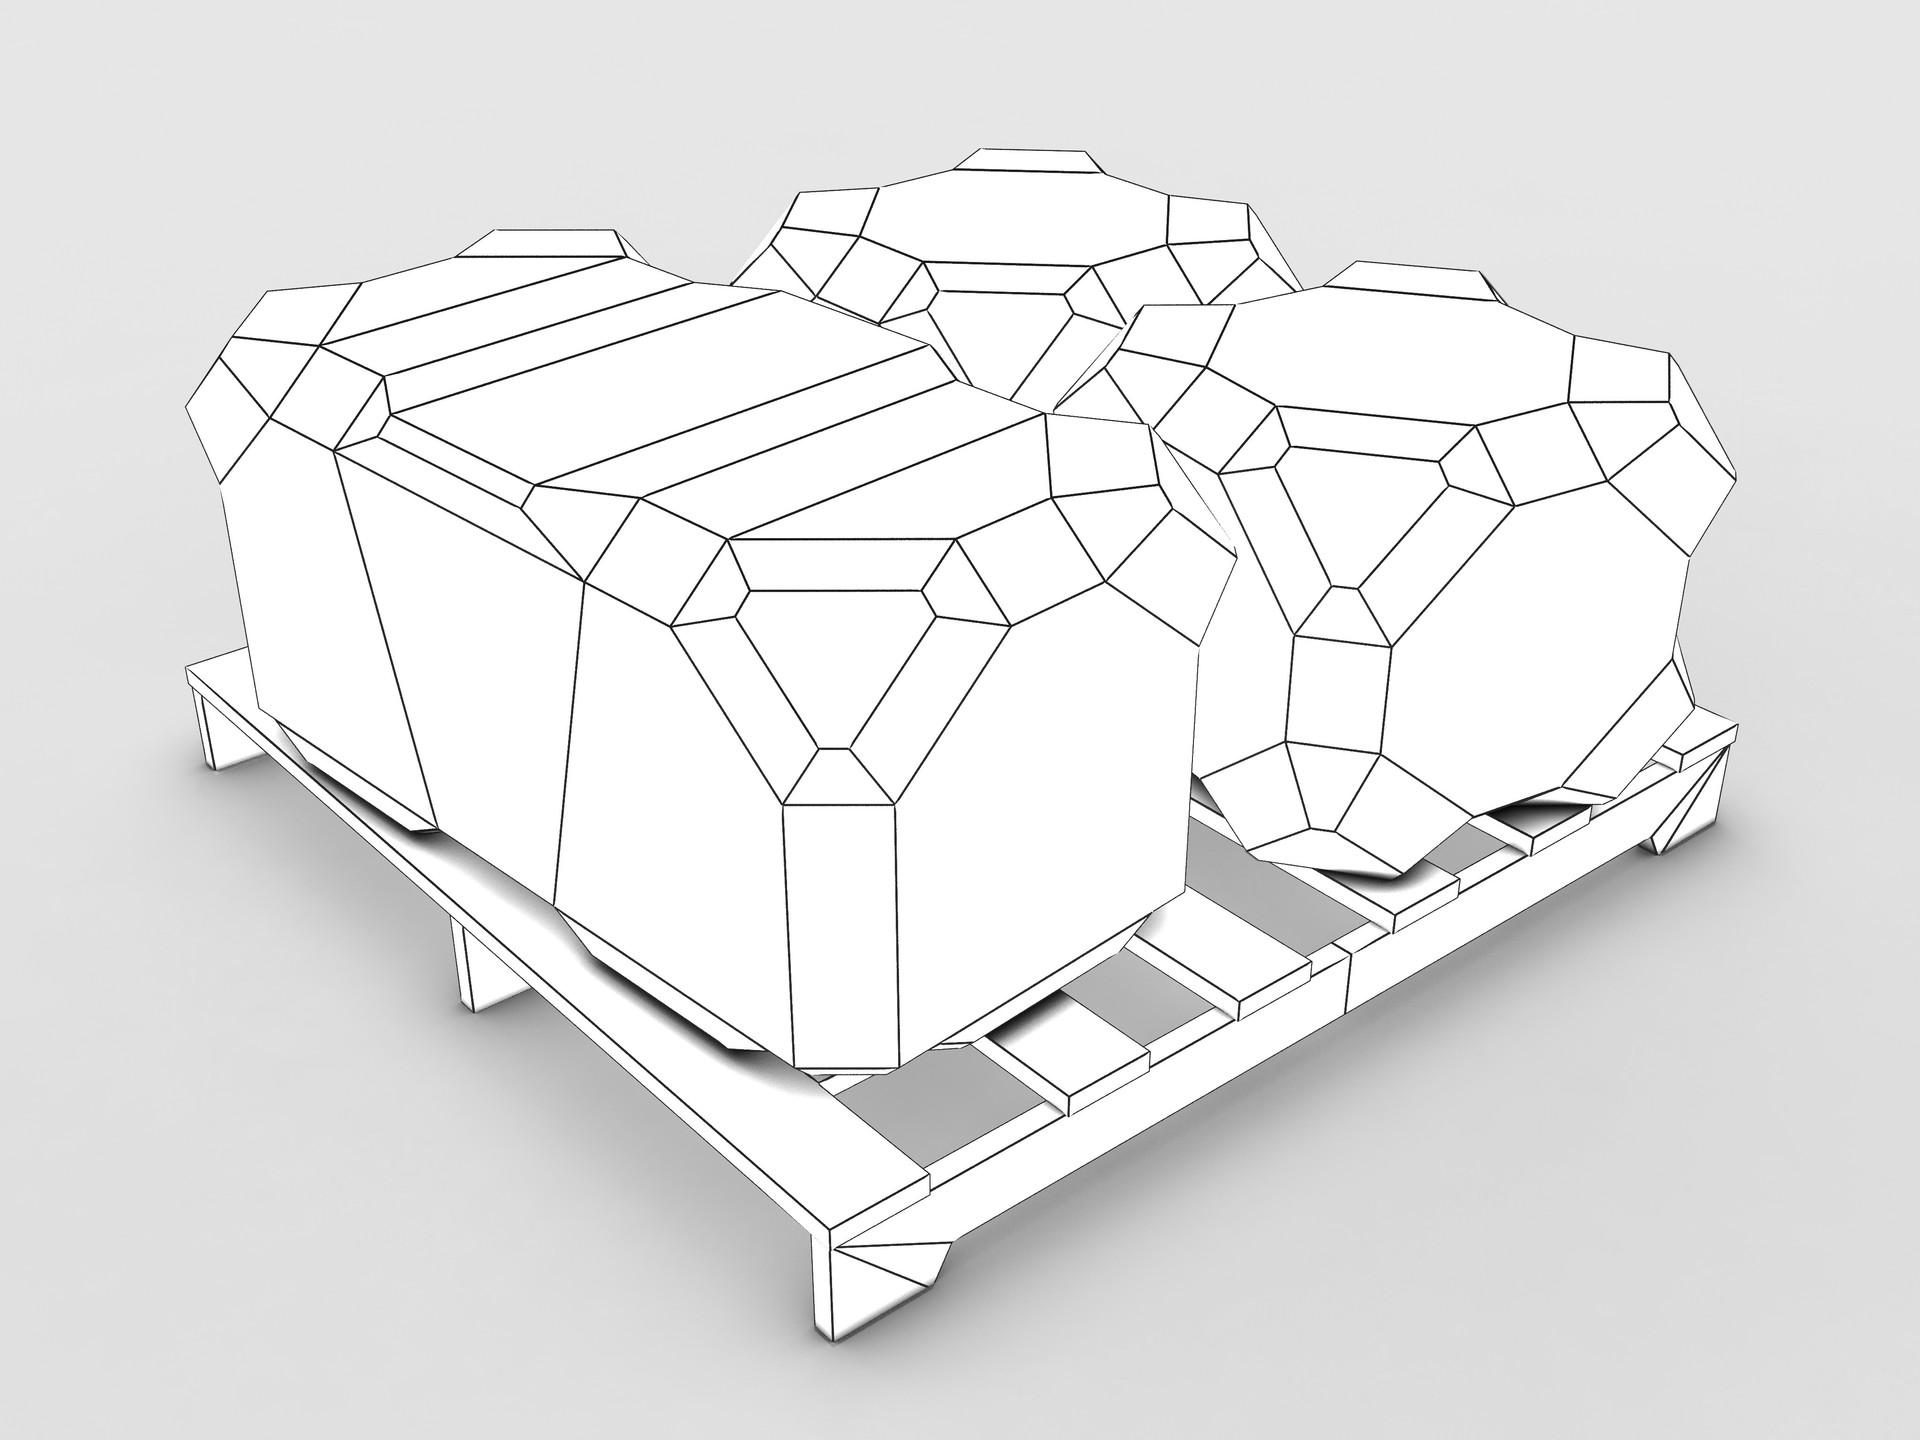 Sci Fi Wiring Diagram Automotive Robot Diagrams Artstation Warehouse Props Sickhead Games Rh Com Soldier Robots